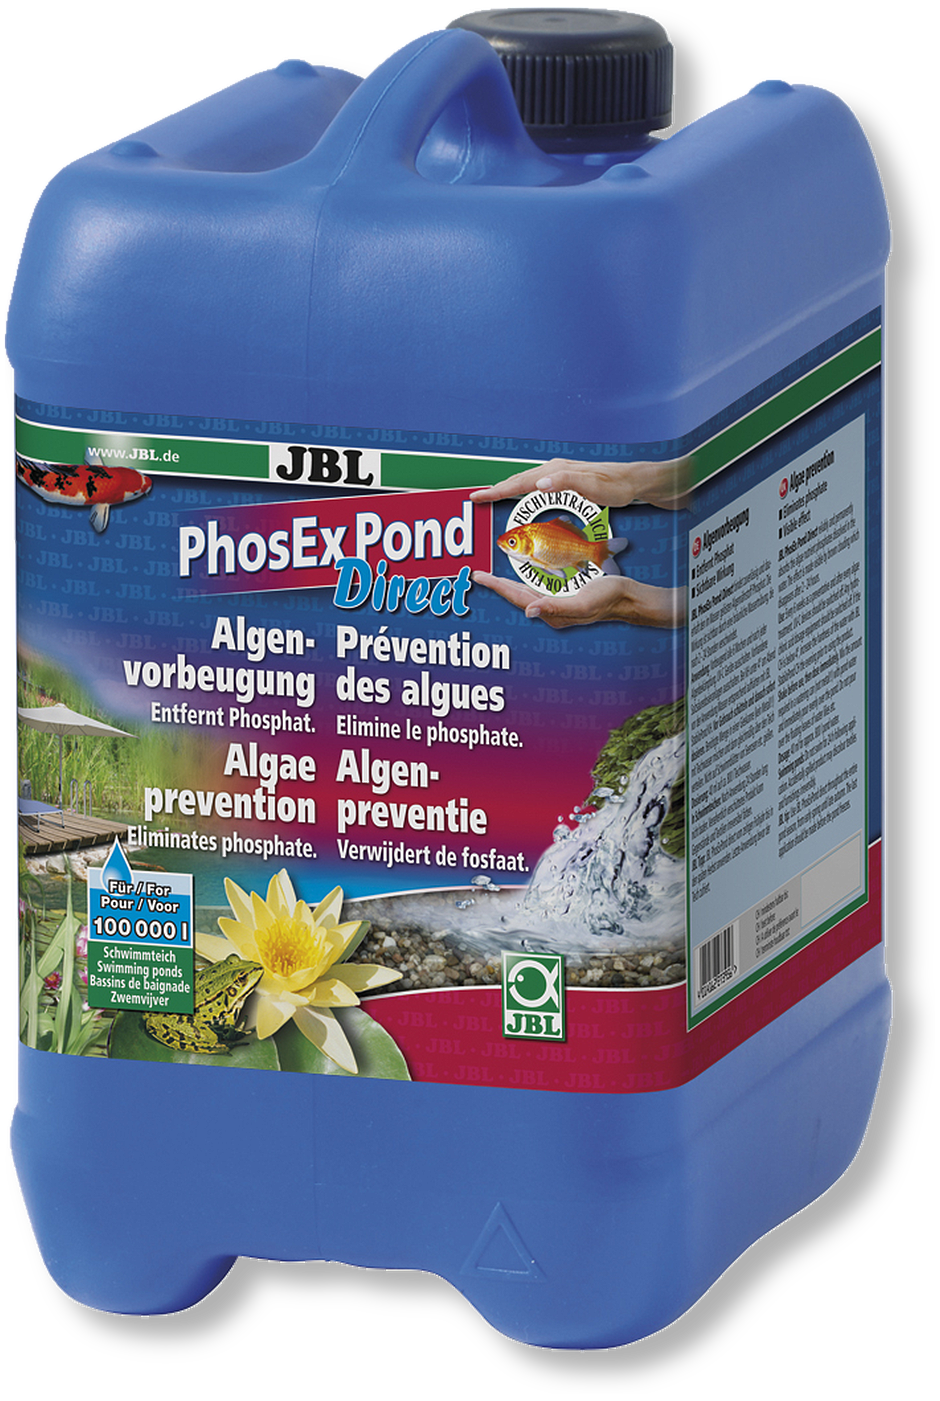 JBL PhosEx Pond Direct 2,5 l